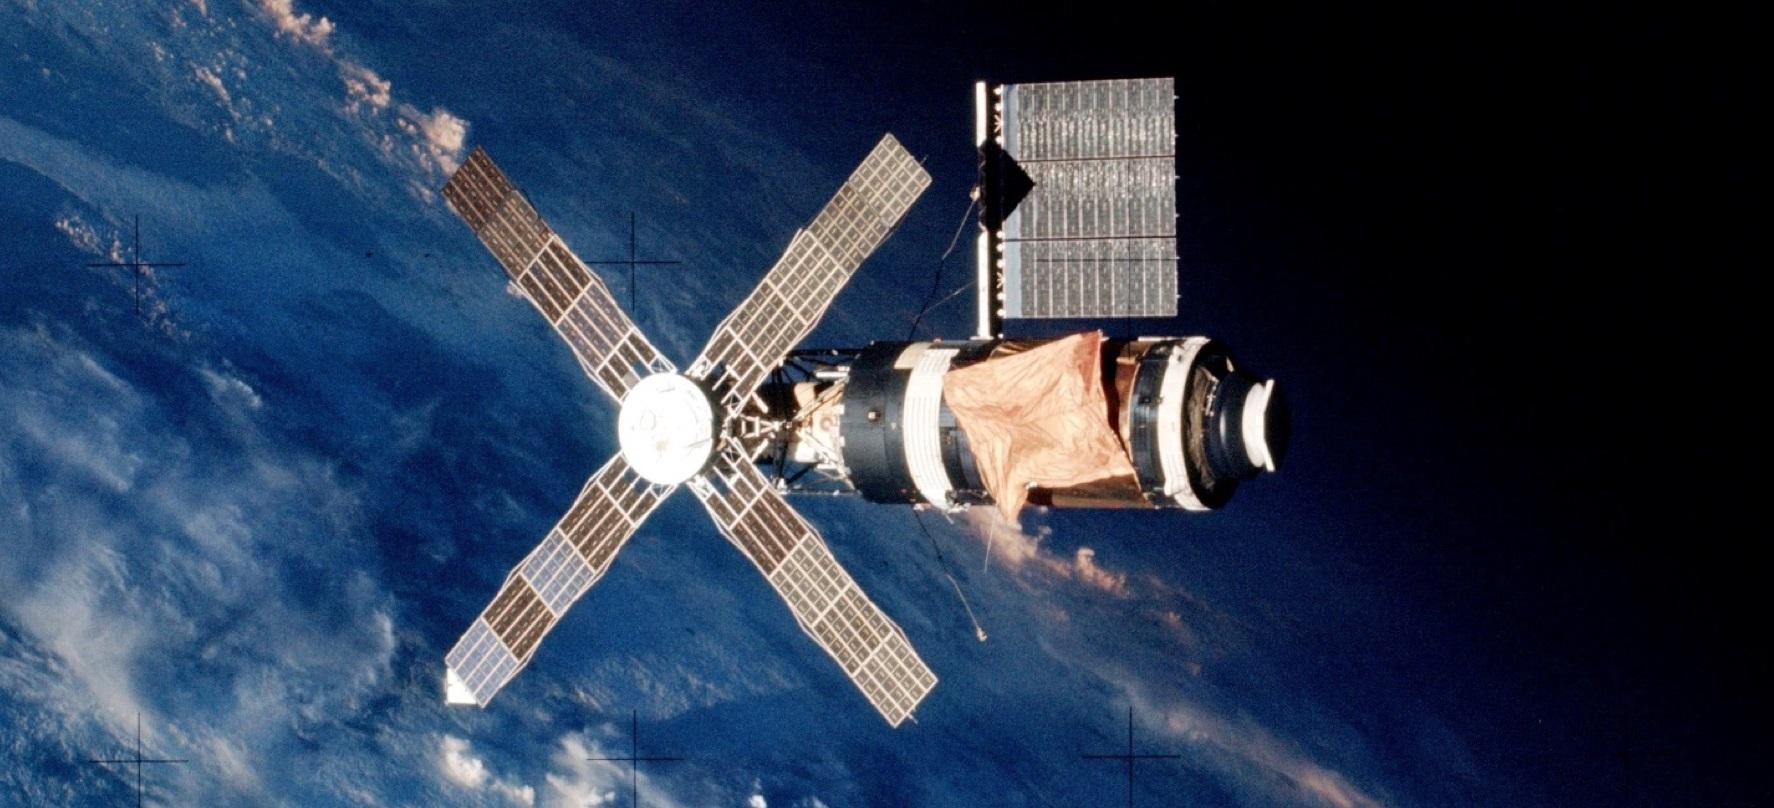 skylab-4-urallomas-3.jpg